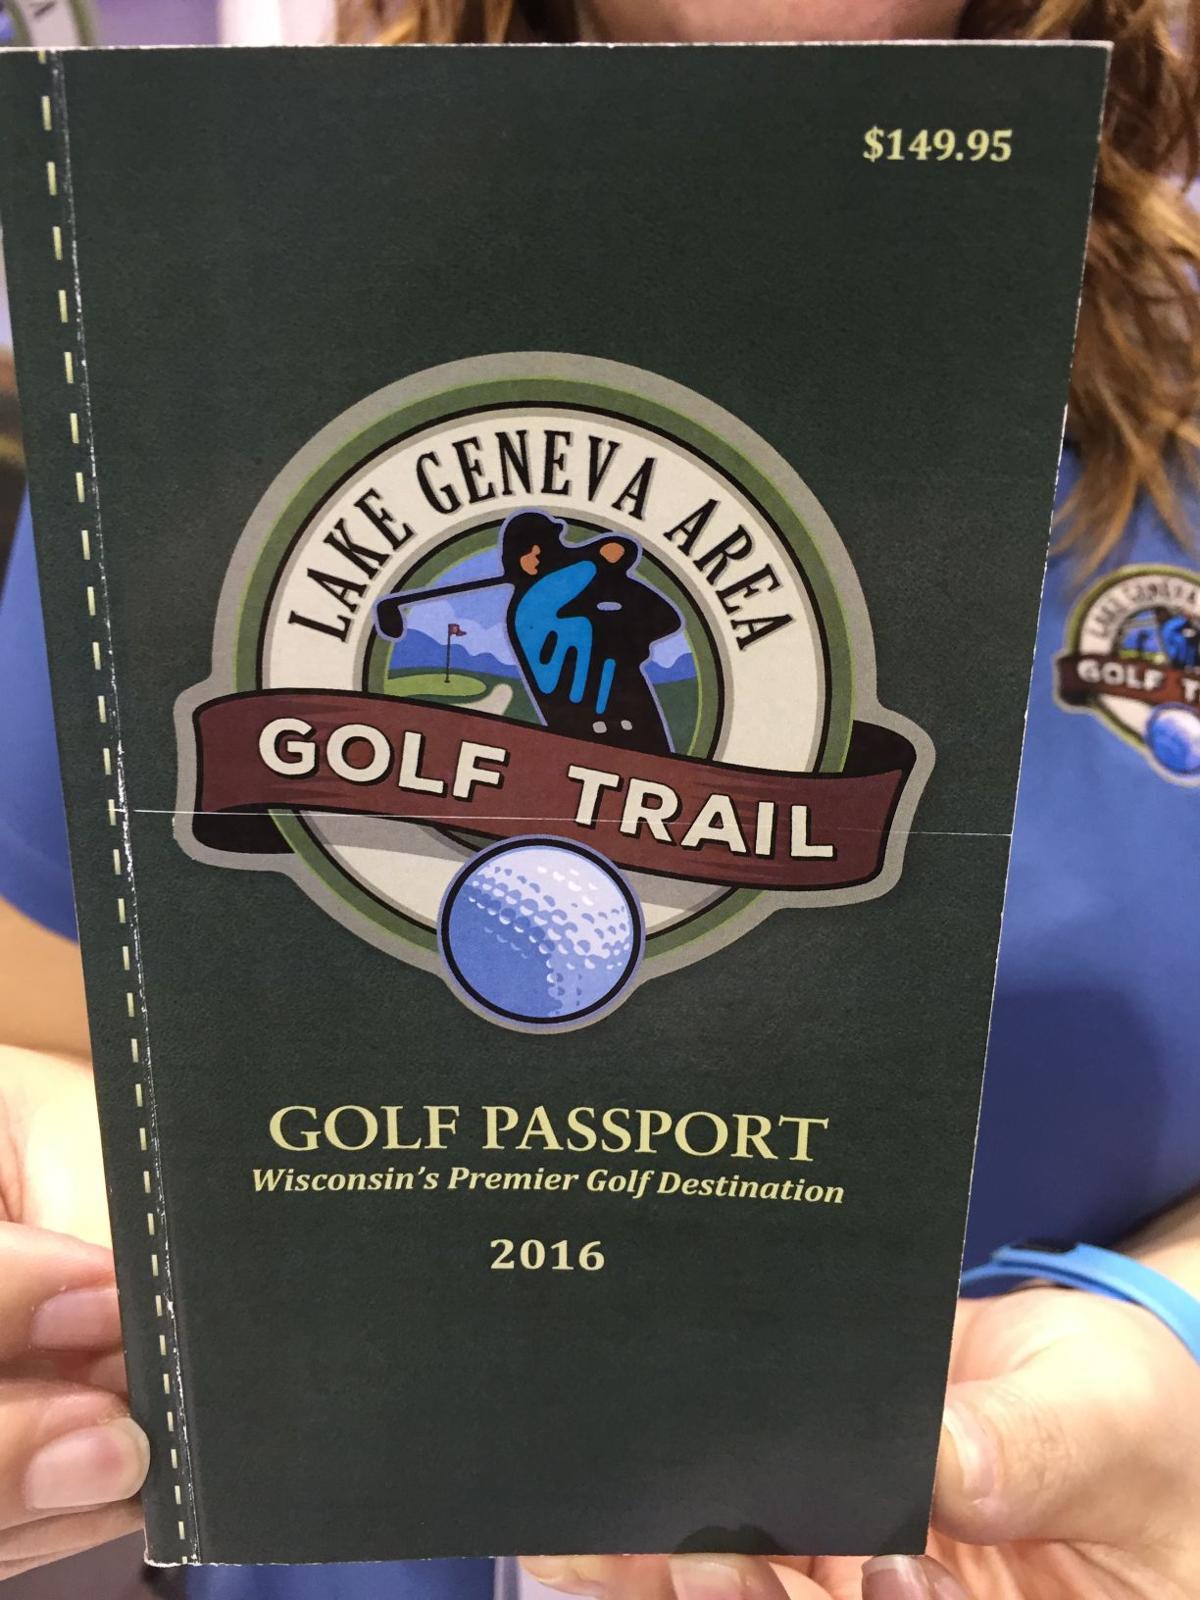 Lake Geneva Golf Trail passport